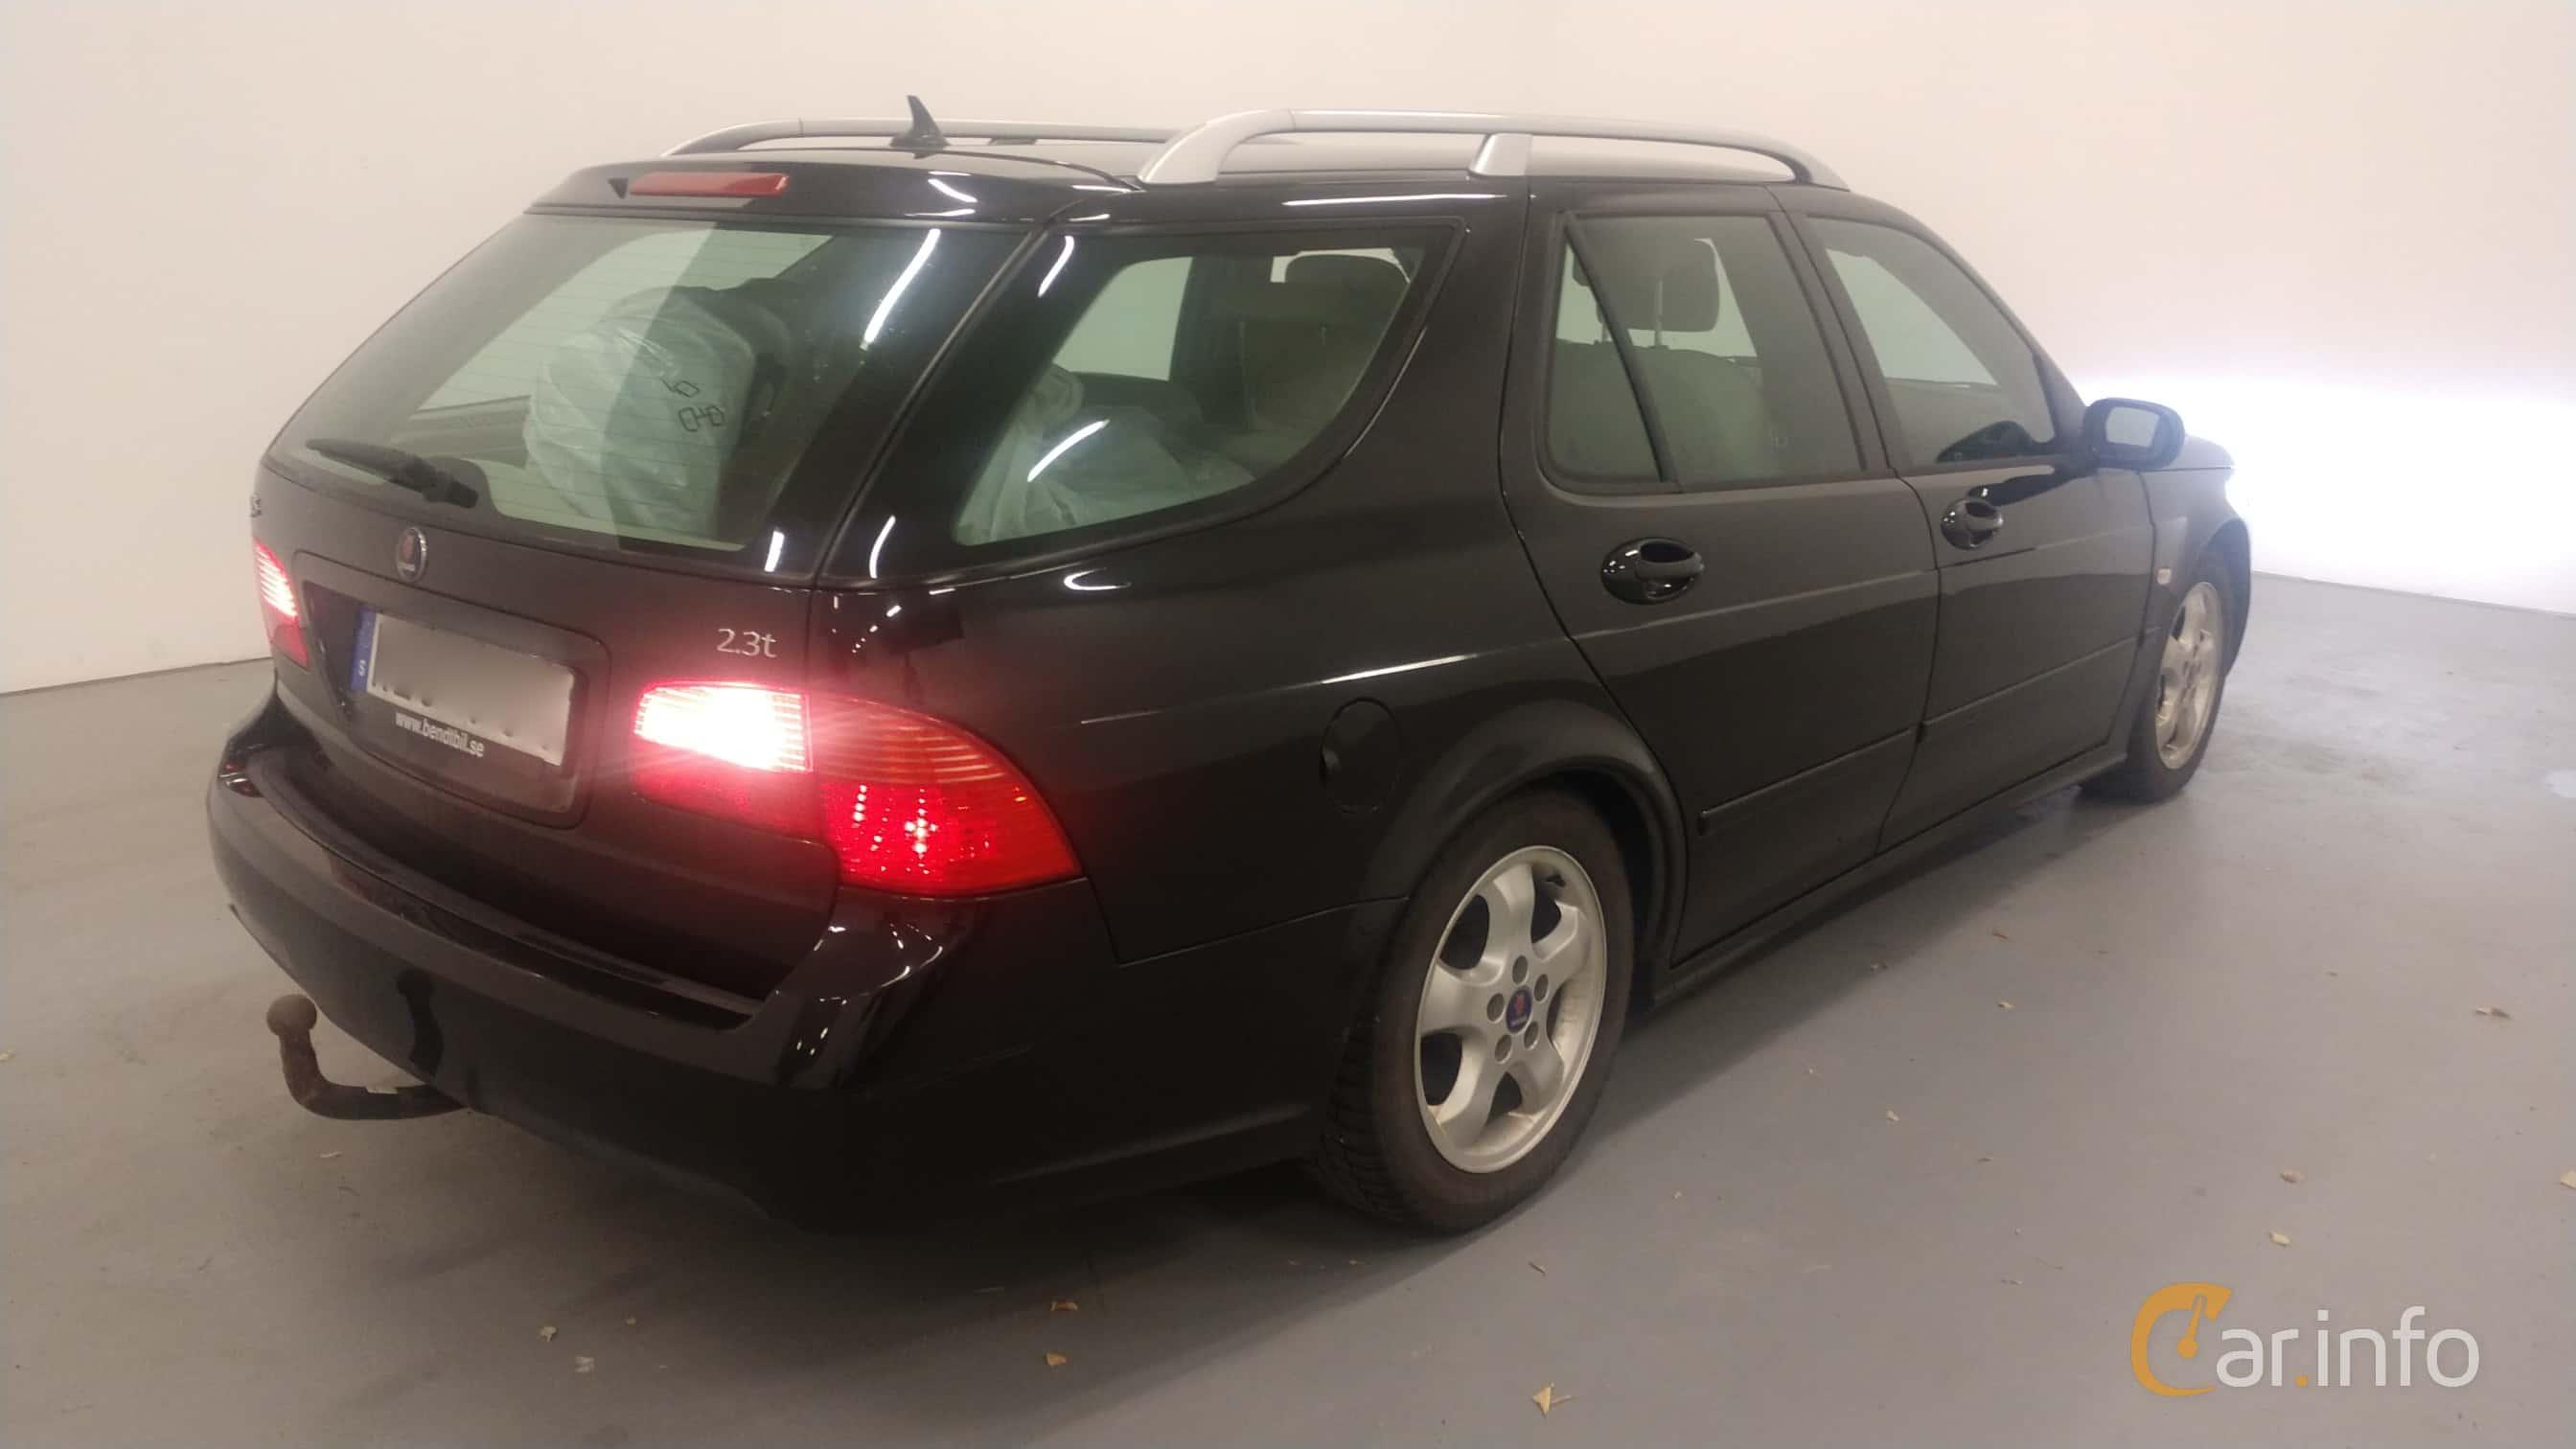 Saab 9 5 Sportcombi Back Side 1 665640